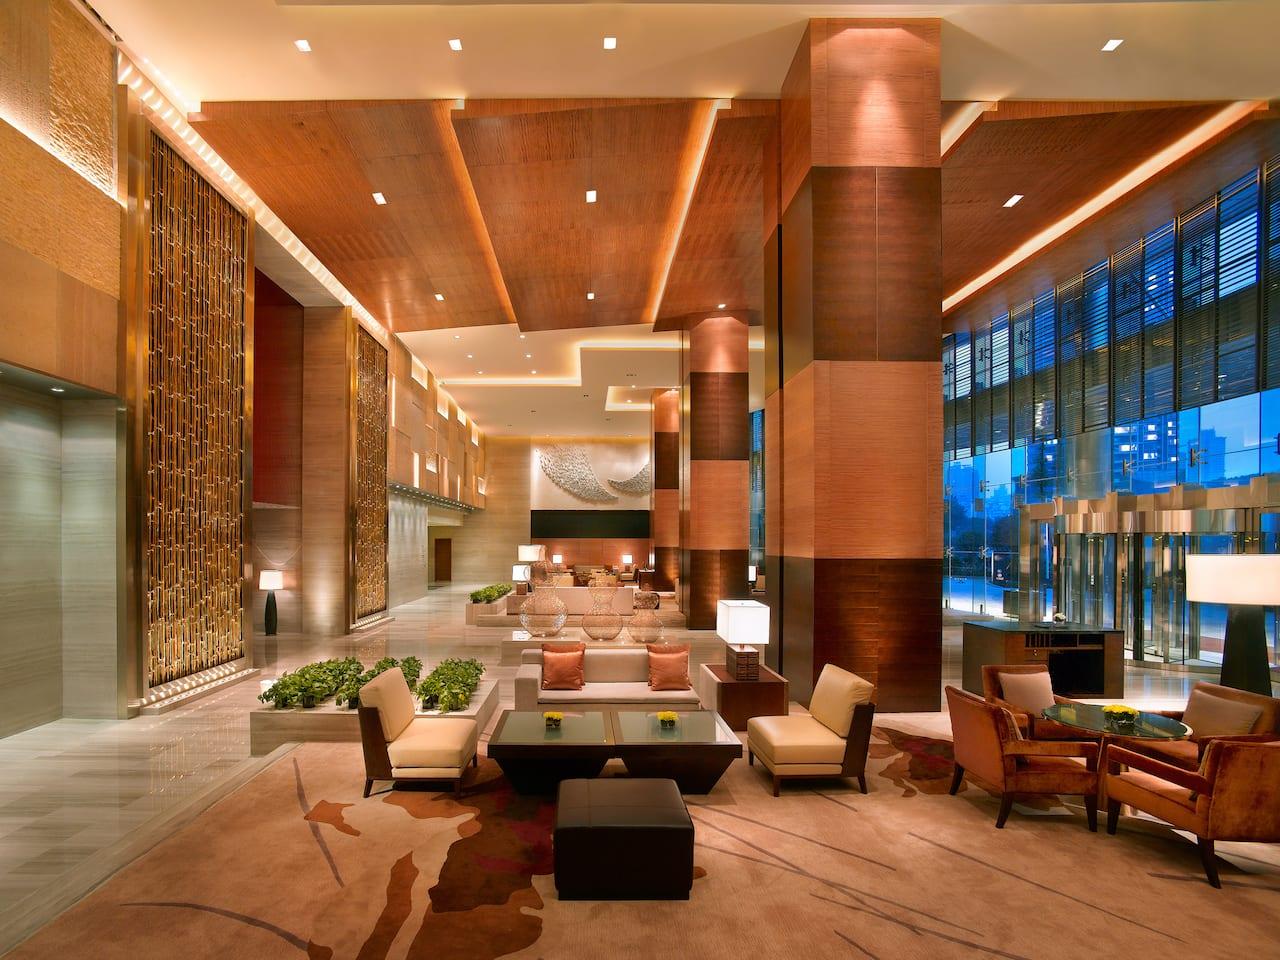 Hyatt Regency Chongqing Lobby Lounge